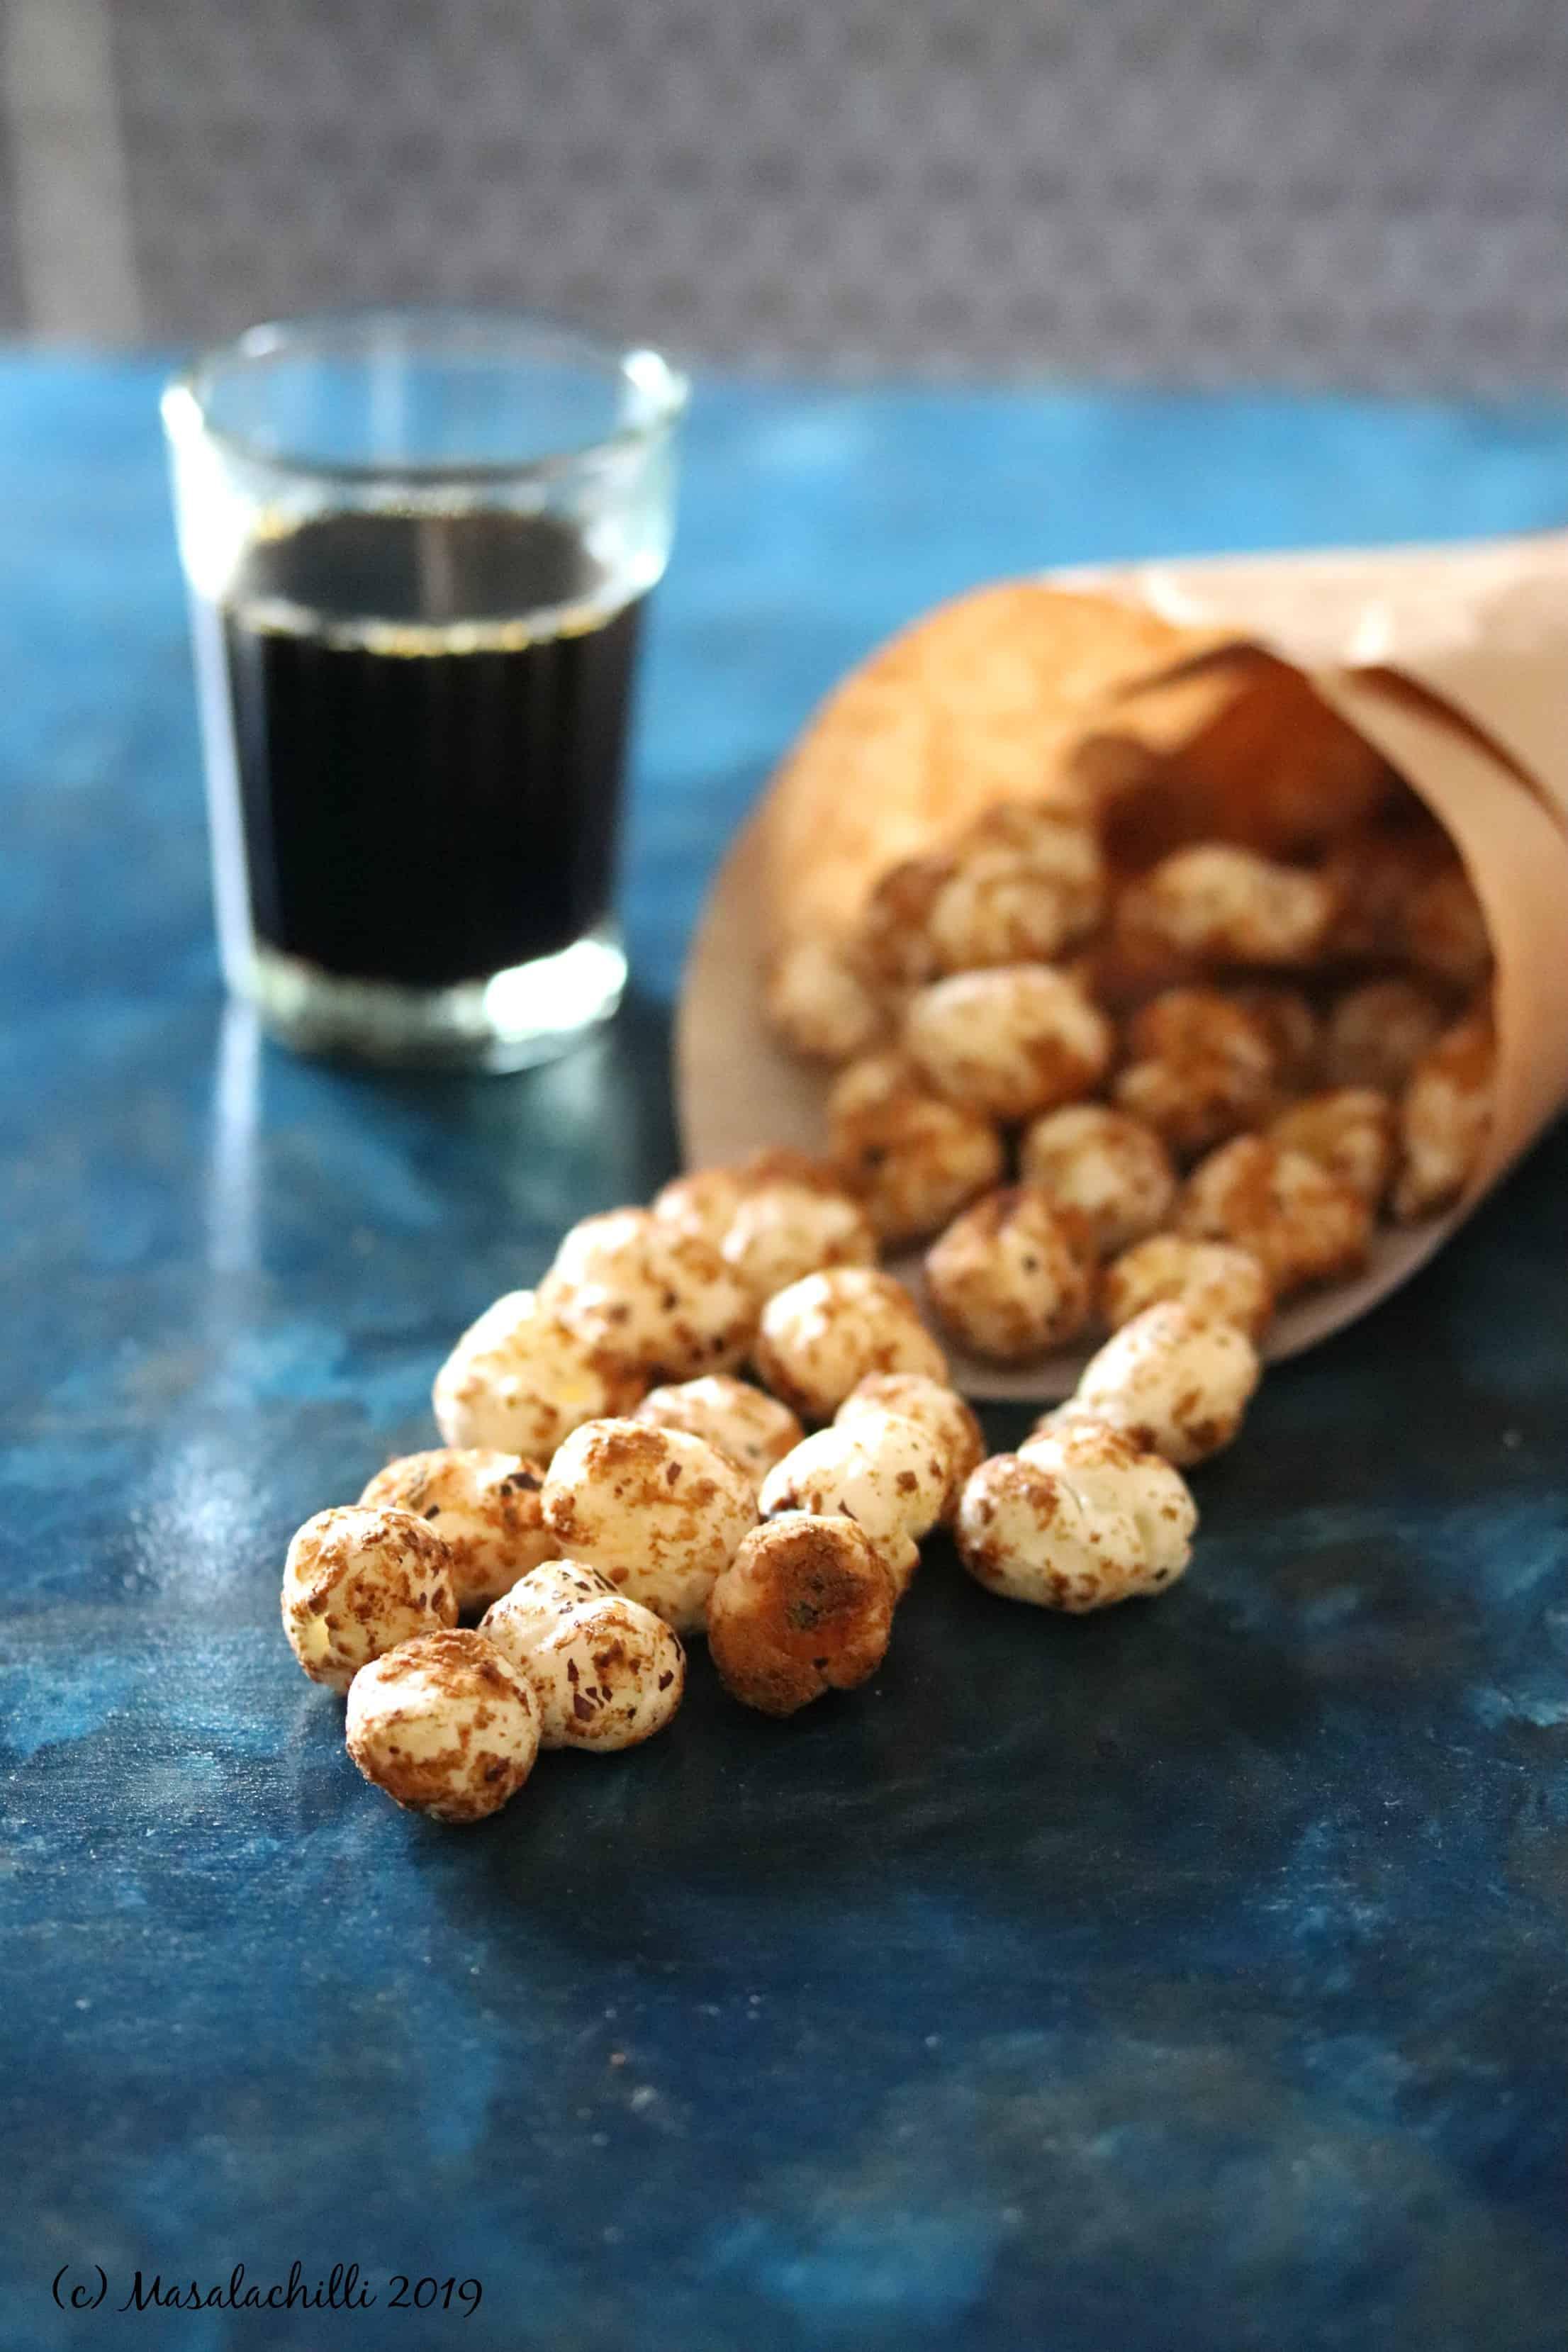 Gur Makhana recipe